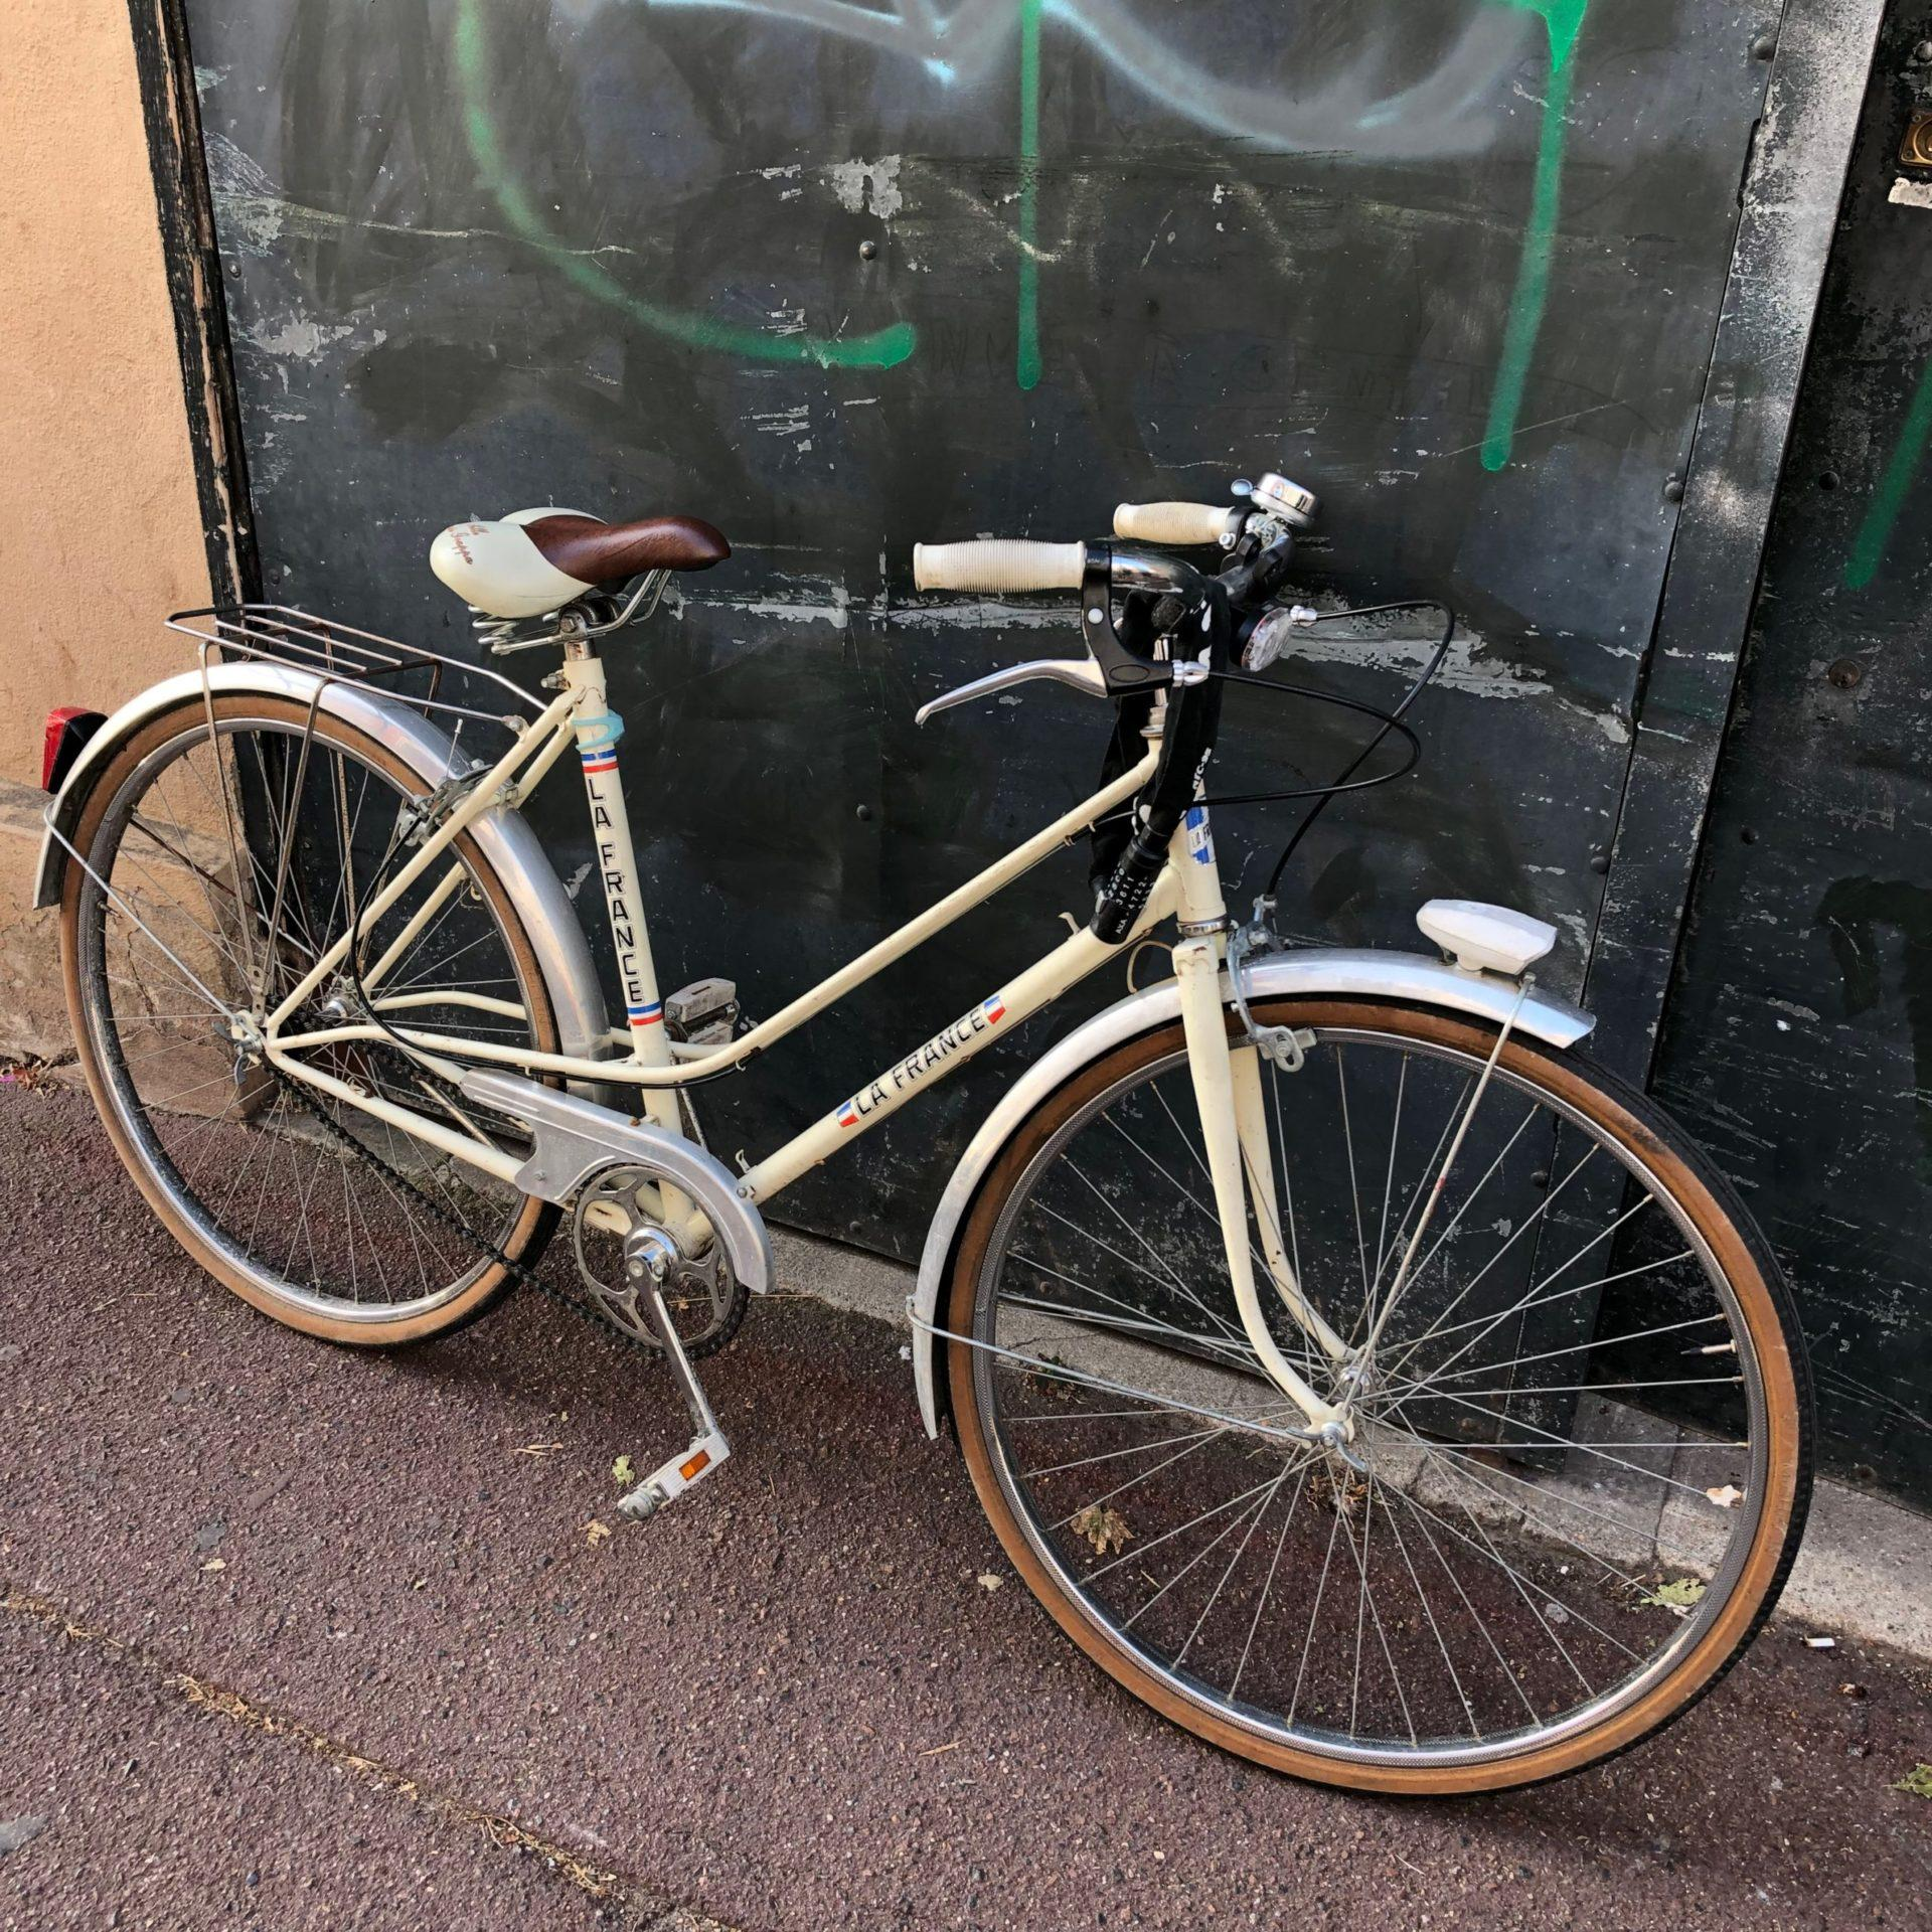 la-soufflerie-delivery-bike